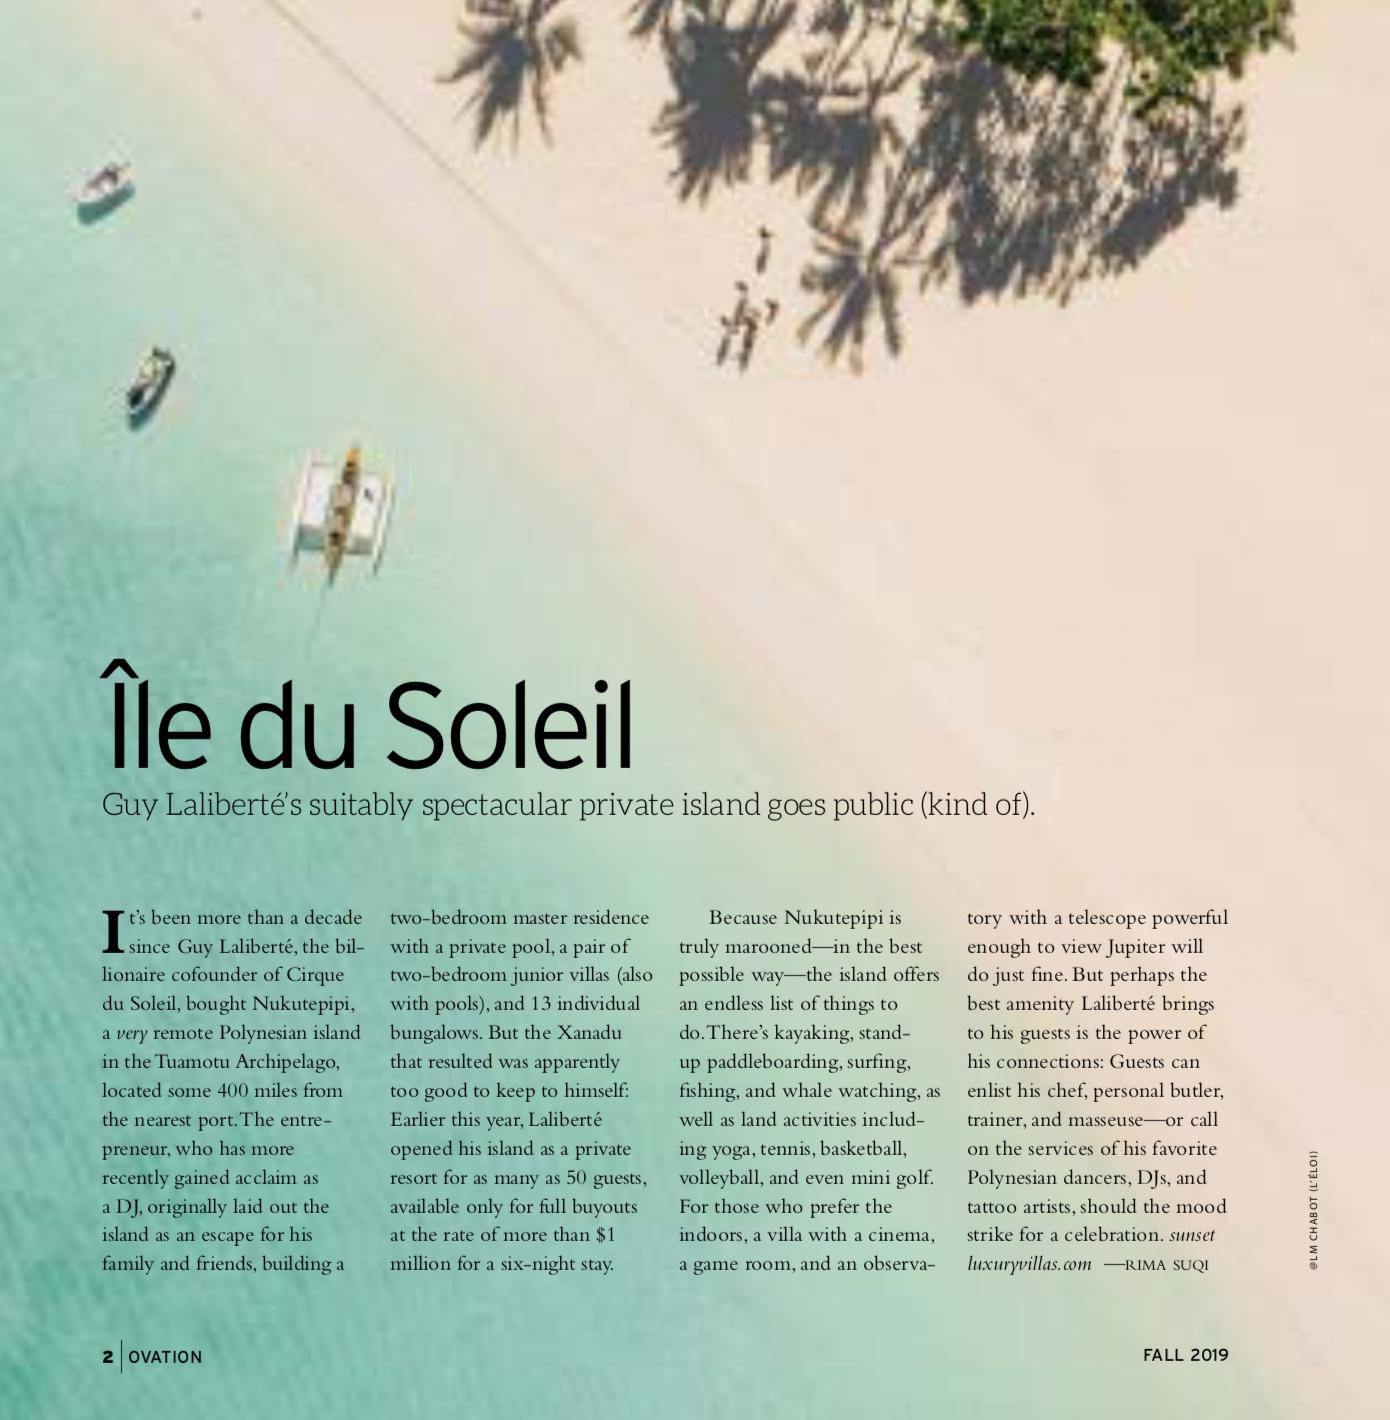 Guy LaLiberte, Nukutepipi, Tahiti